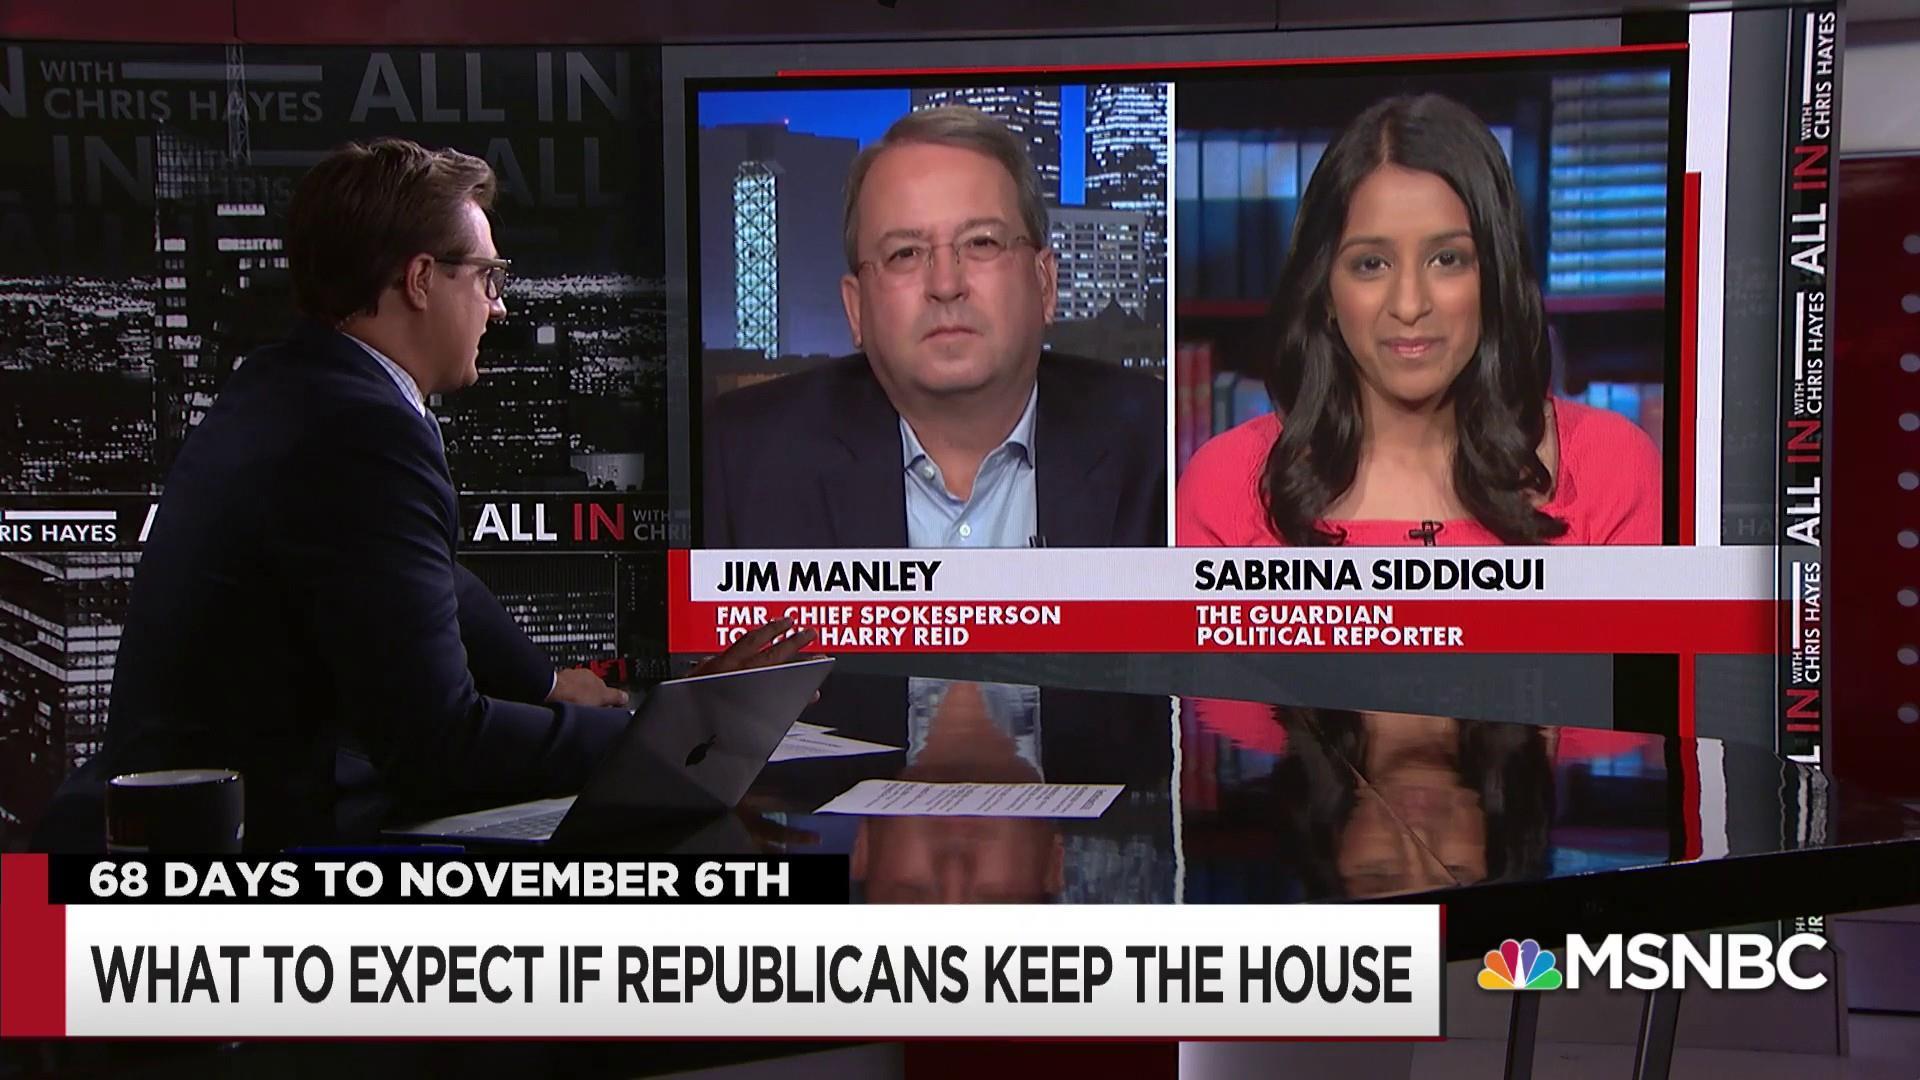 Can republicans keep the house, ALQURUMRESORT.COM